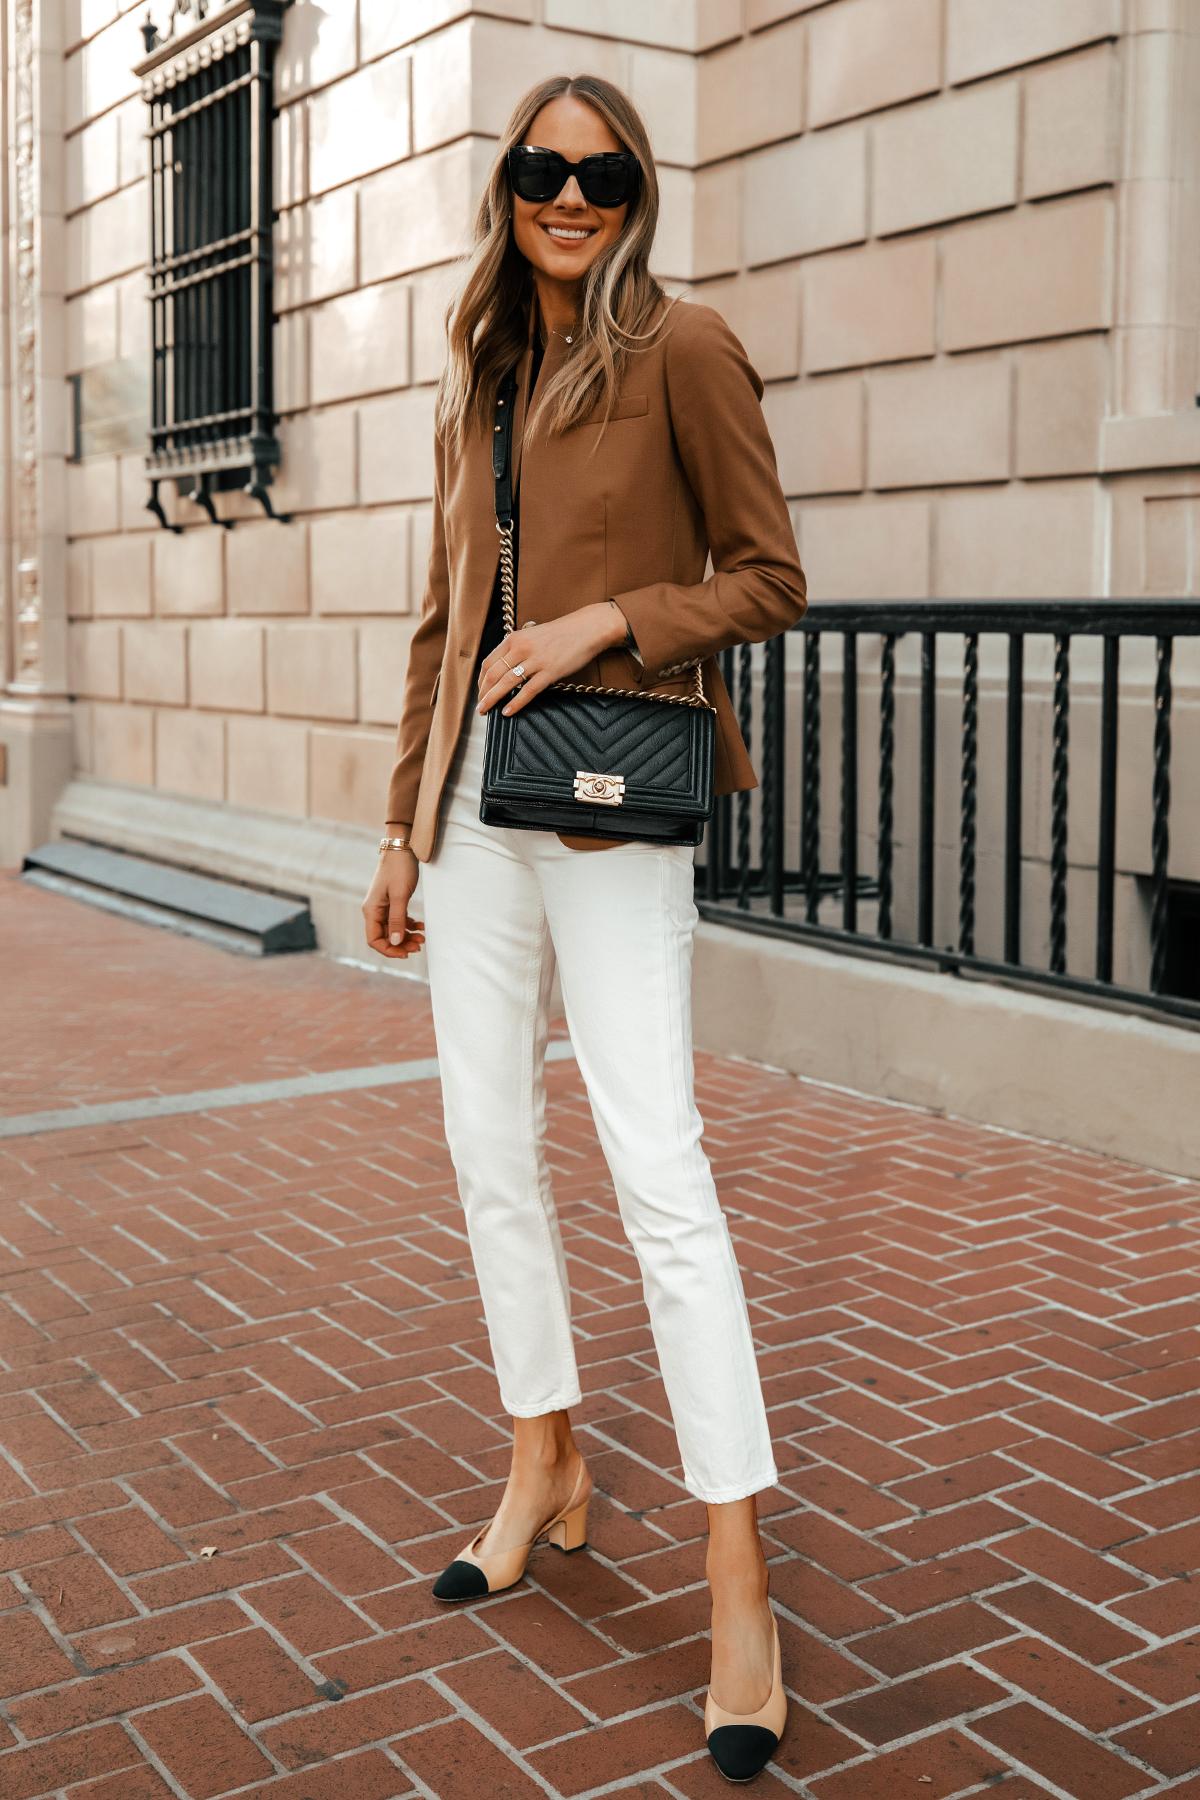 Fashion Jackson Wearing Jcrew Camel Blazer Citizens of Humanity White Jeans Chanel Slingbacks Chanel Black Boy Bag 1